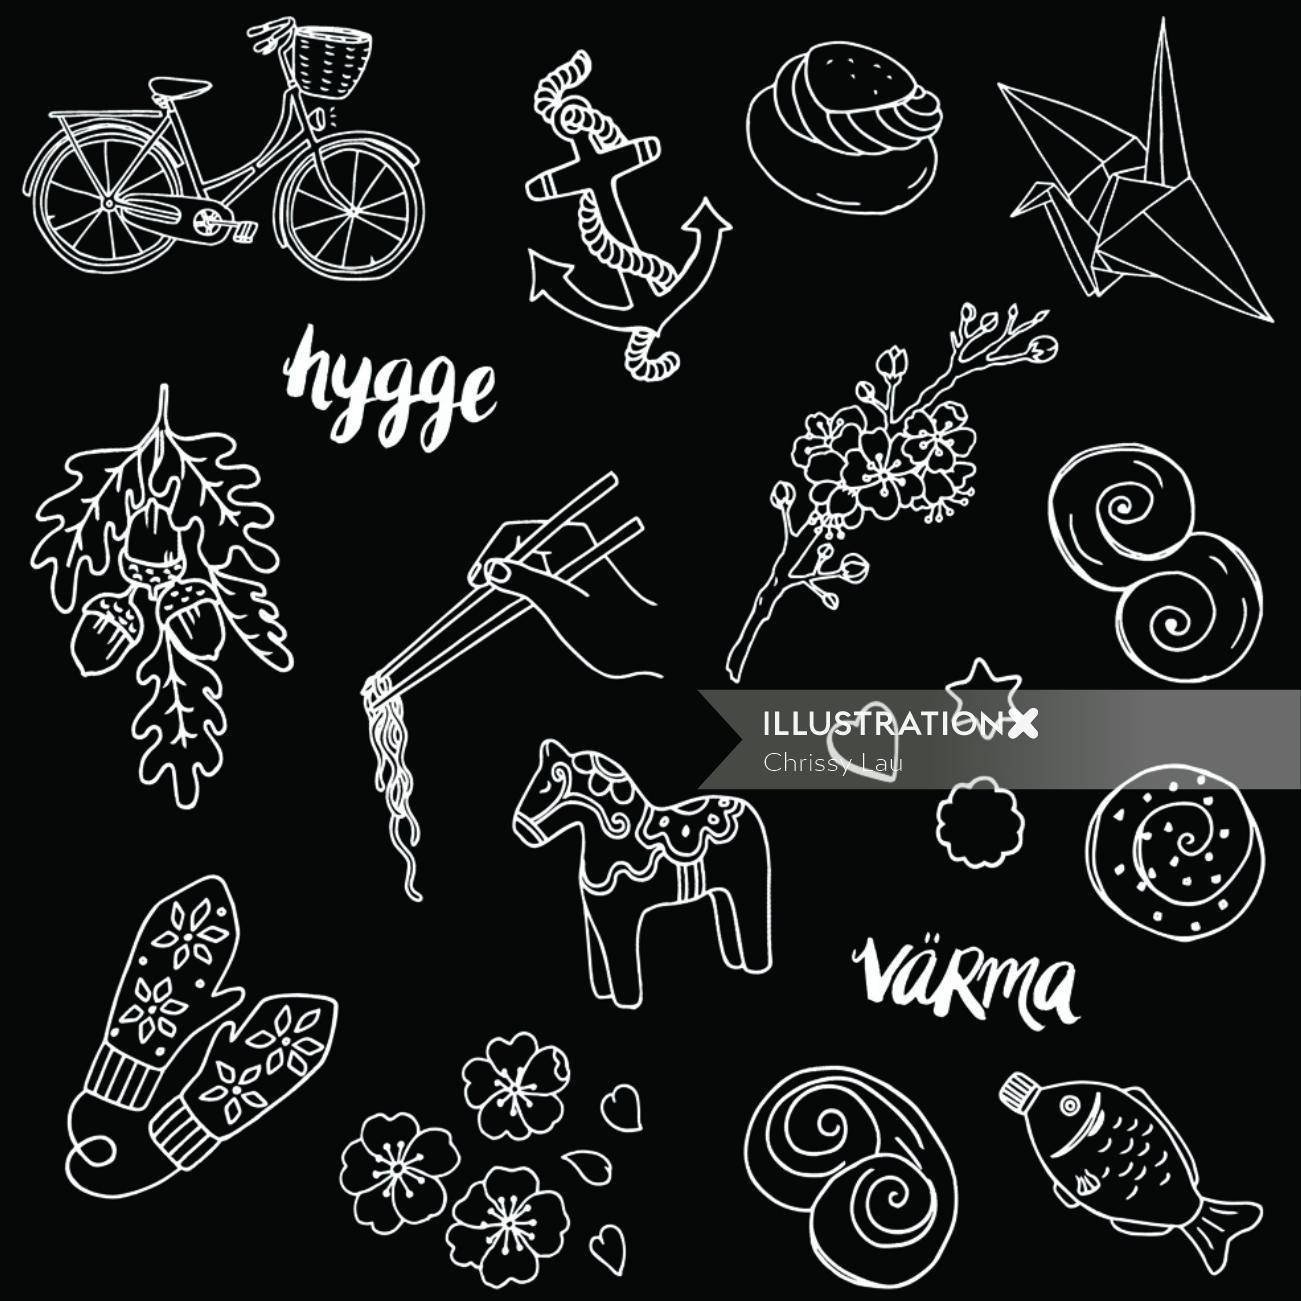 Print patterns on black background